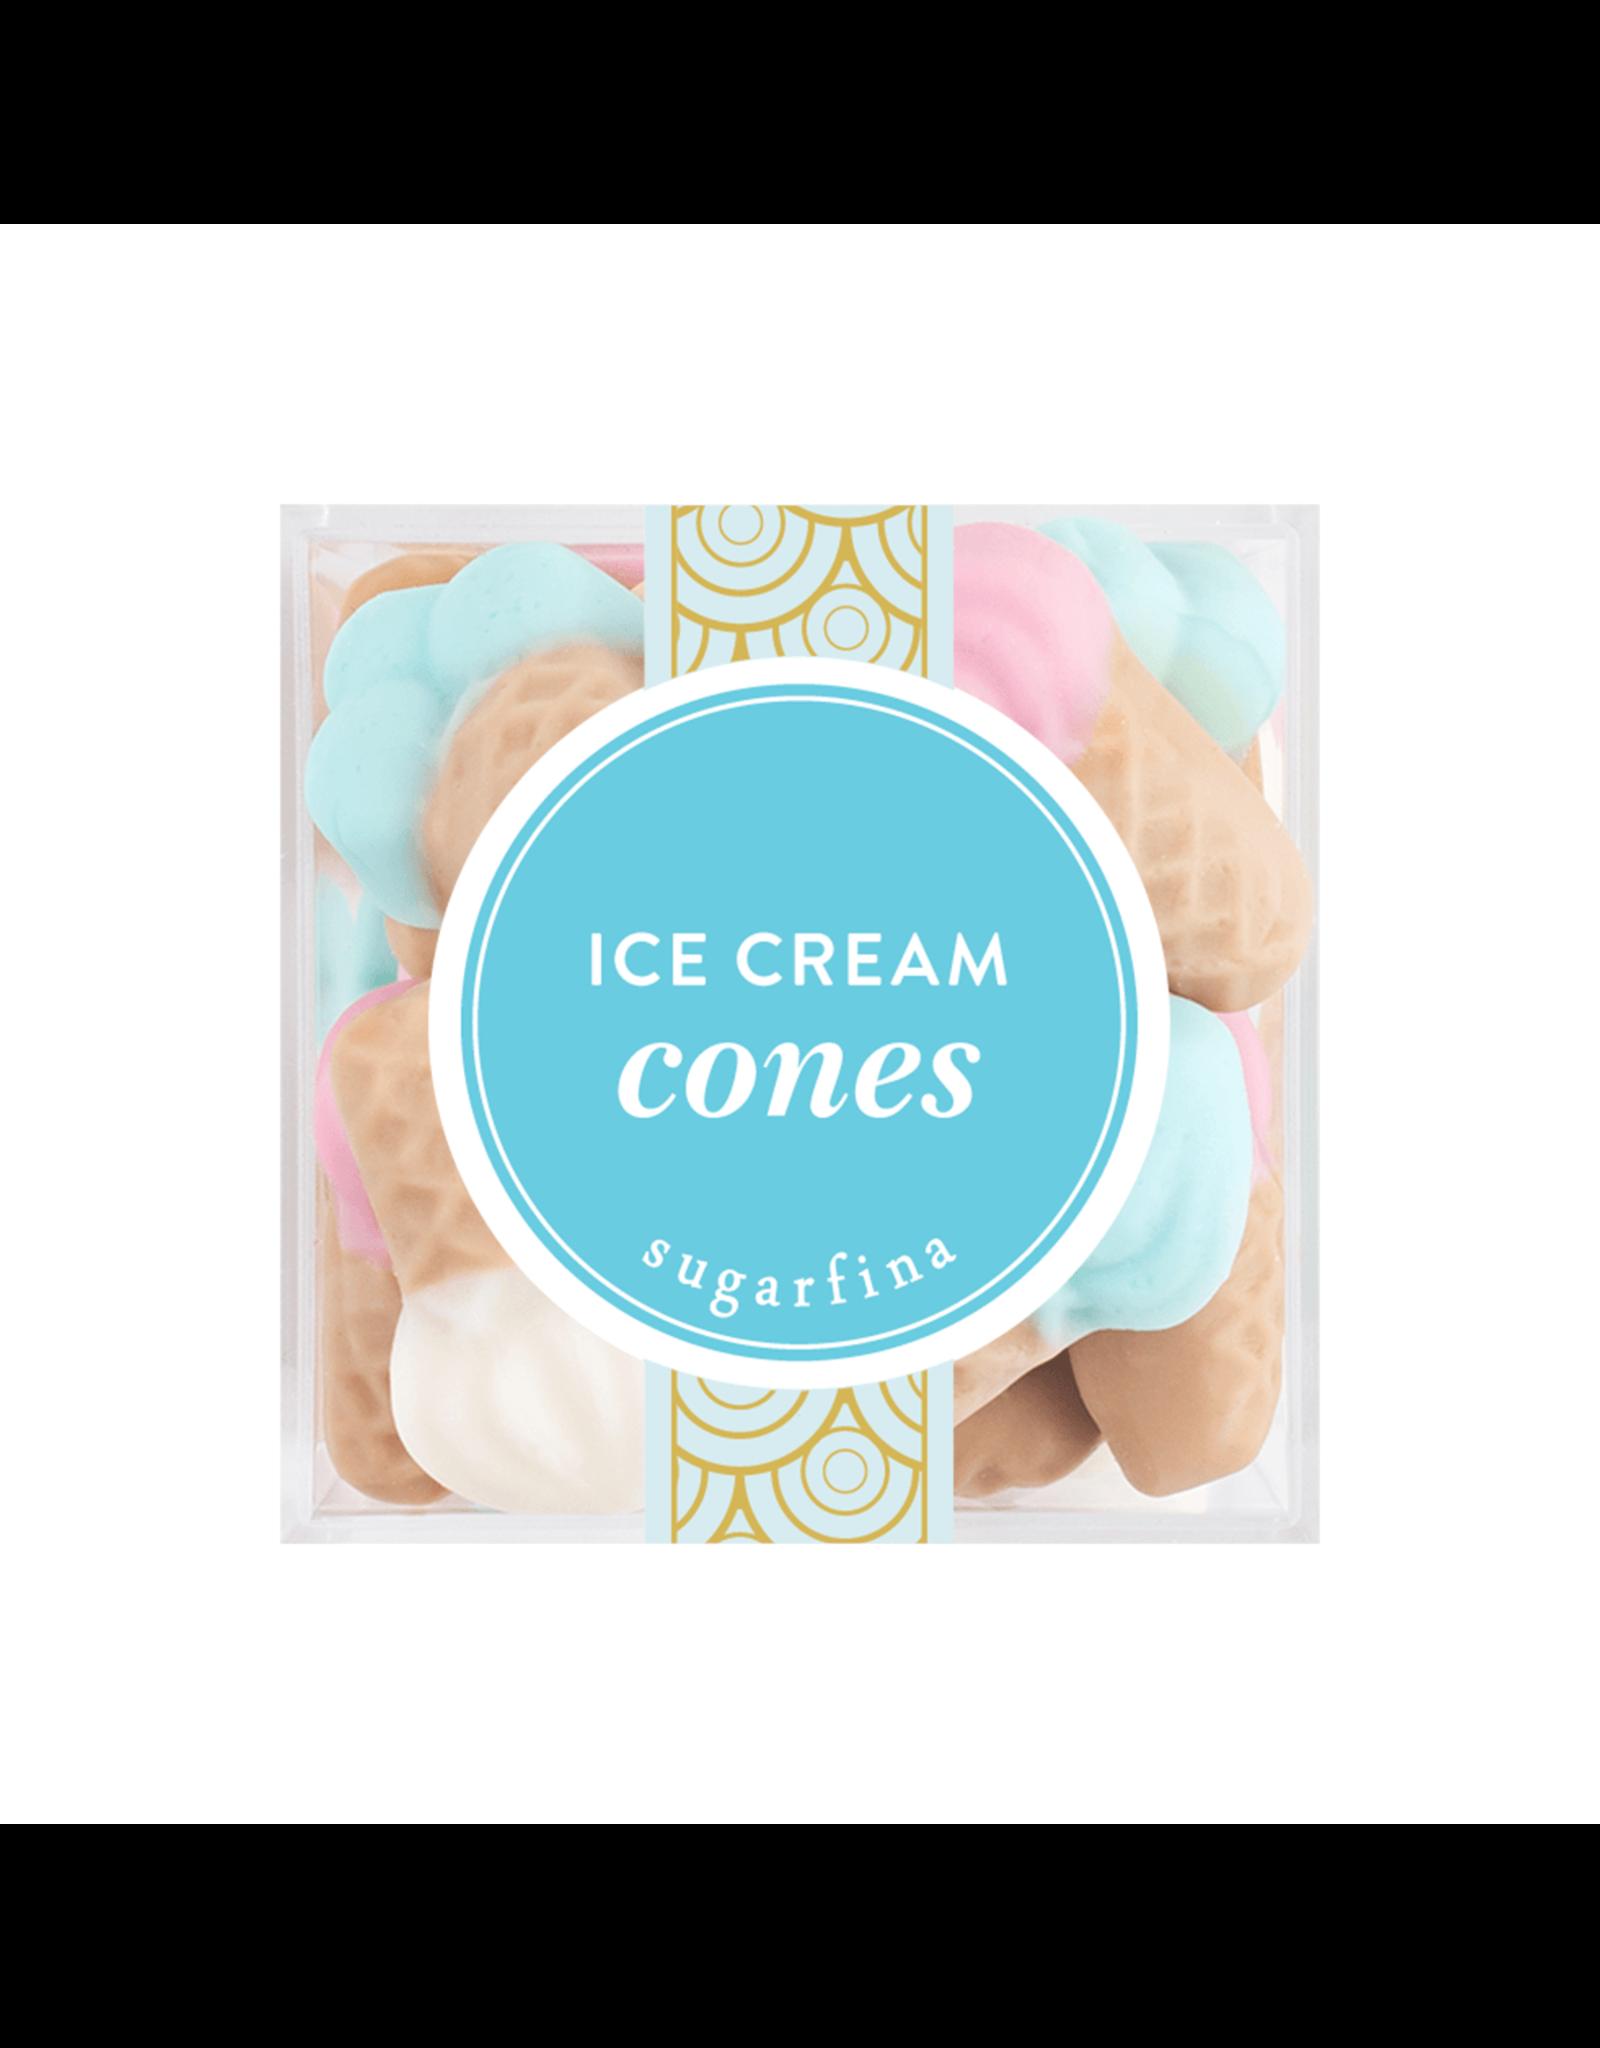 Sugarfina Ice Cream Cones